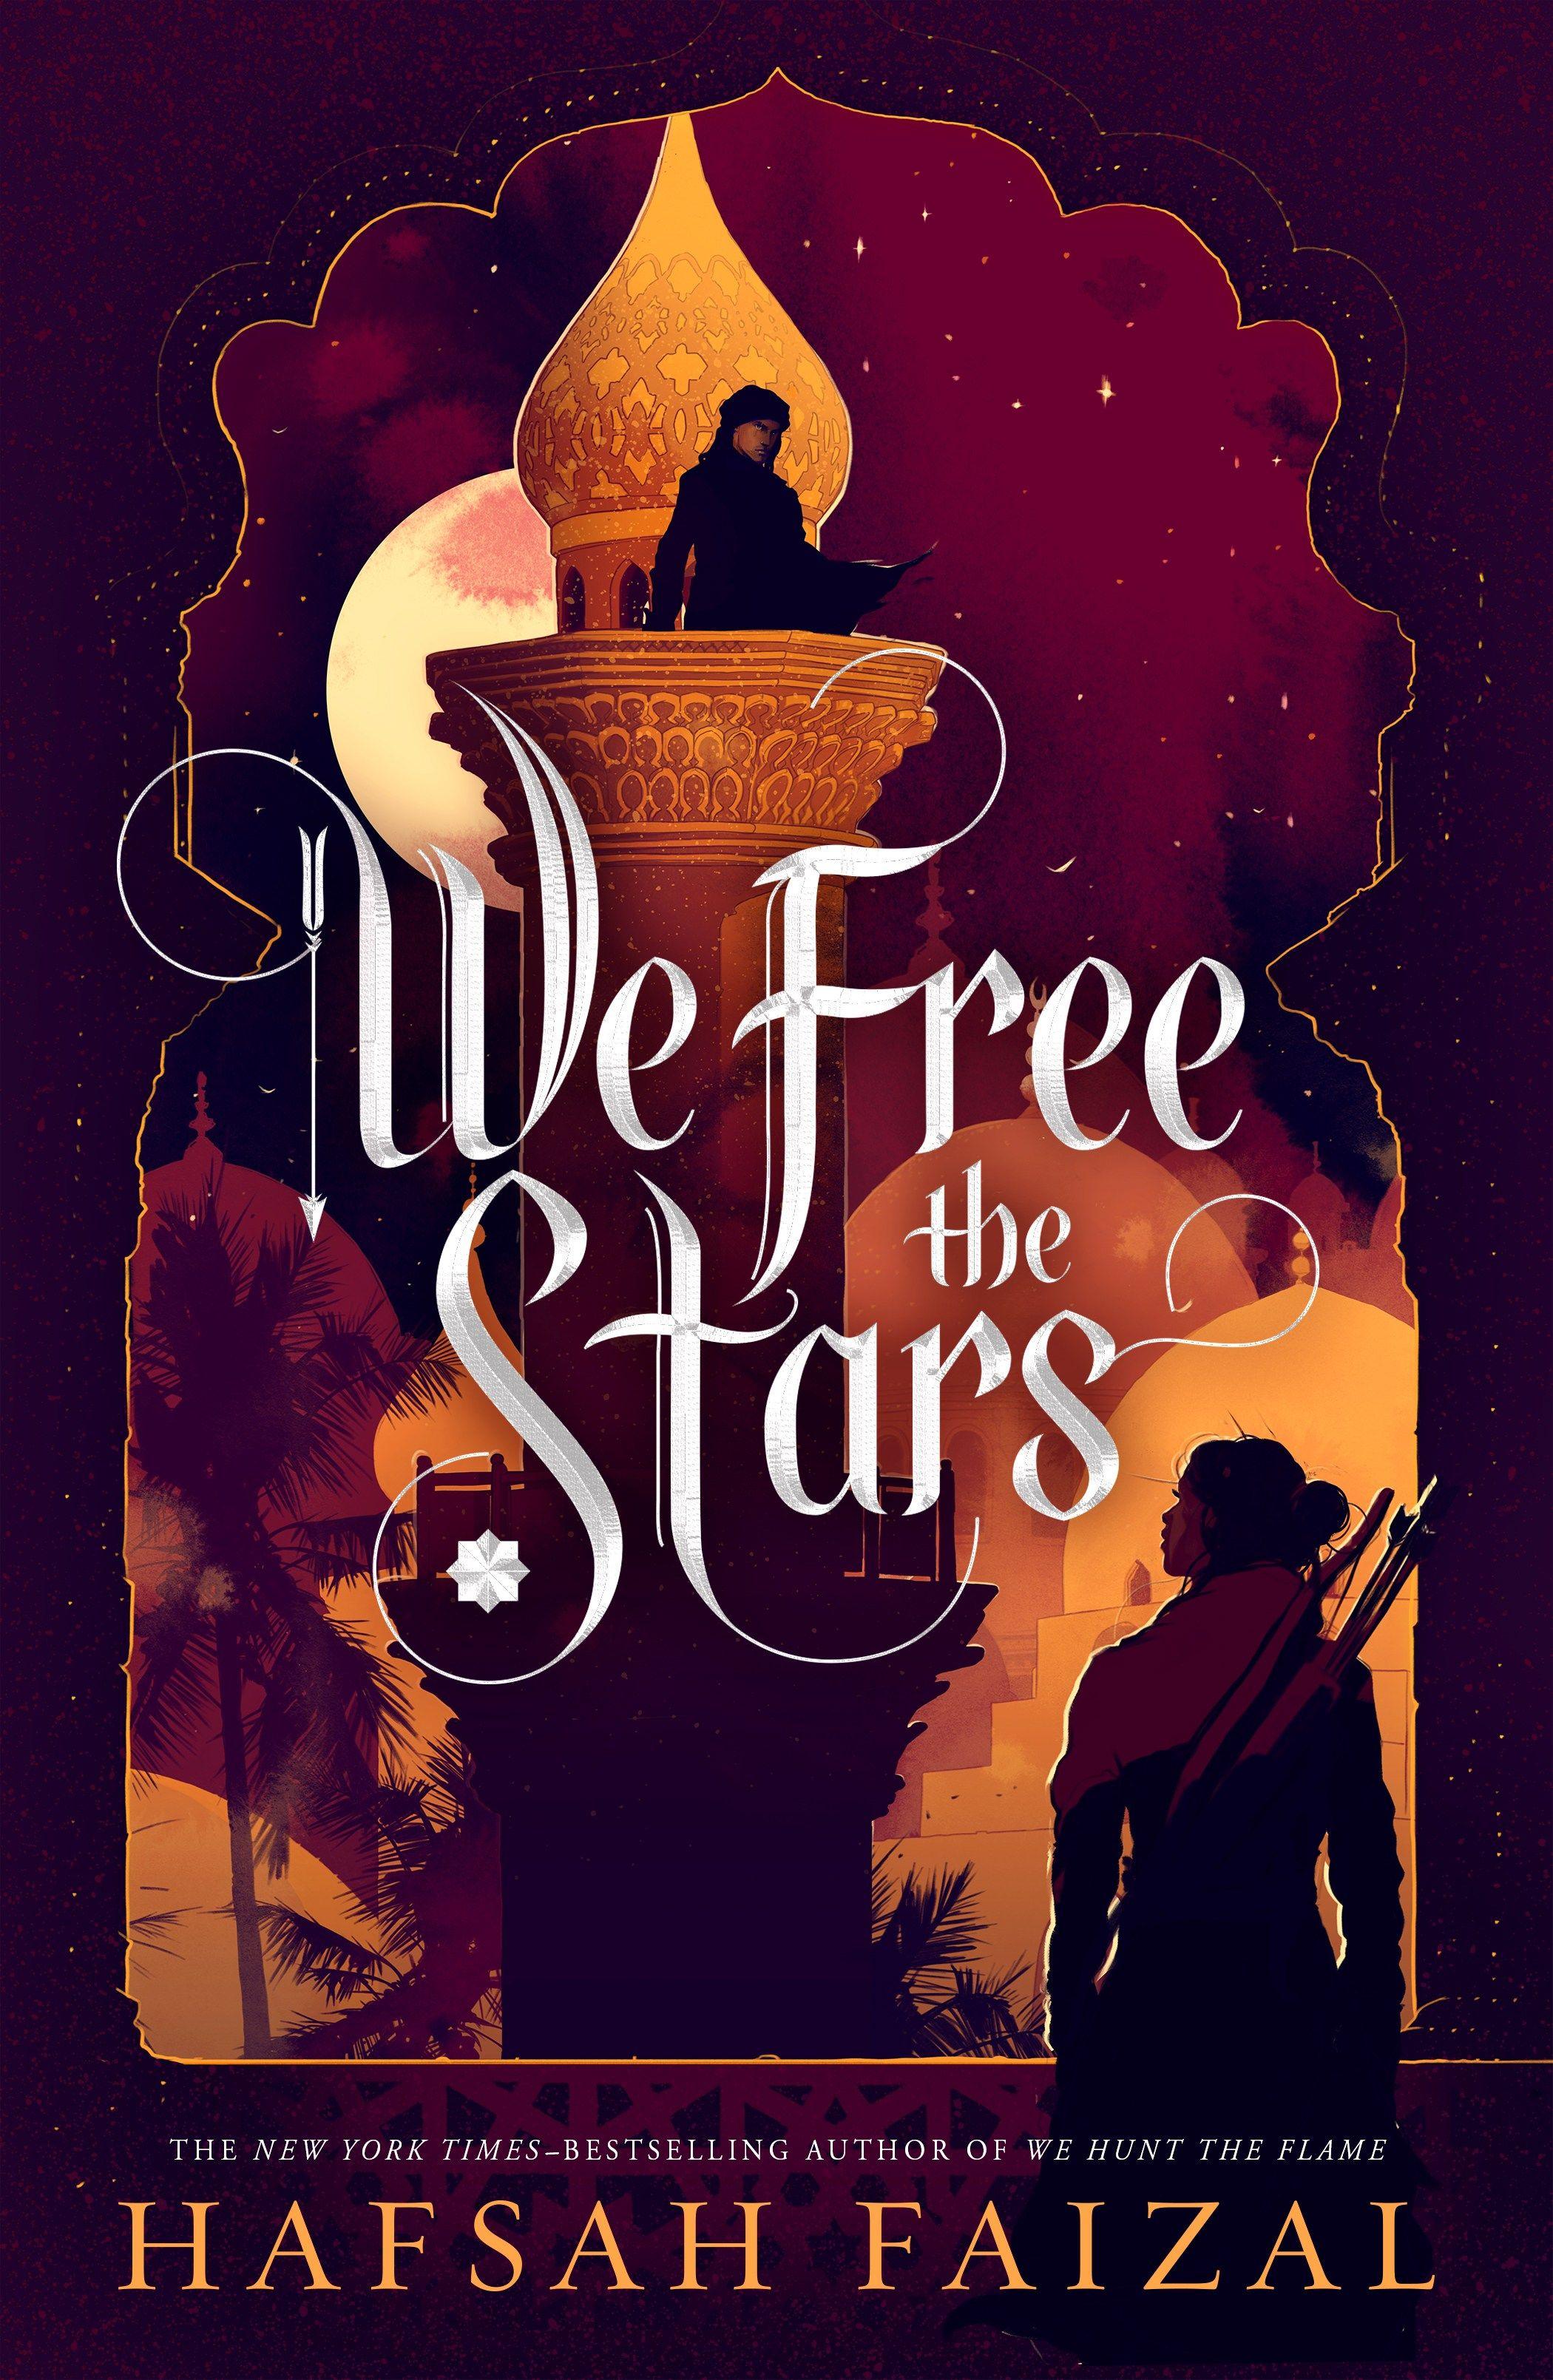 Pdf We Free The Stars Sands Of Arawiya 2 By Hafsah Faizal Ya Fantasy Books Book Cover Art Fantasy Books